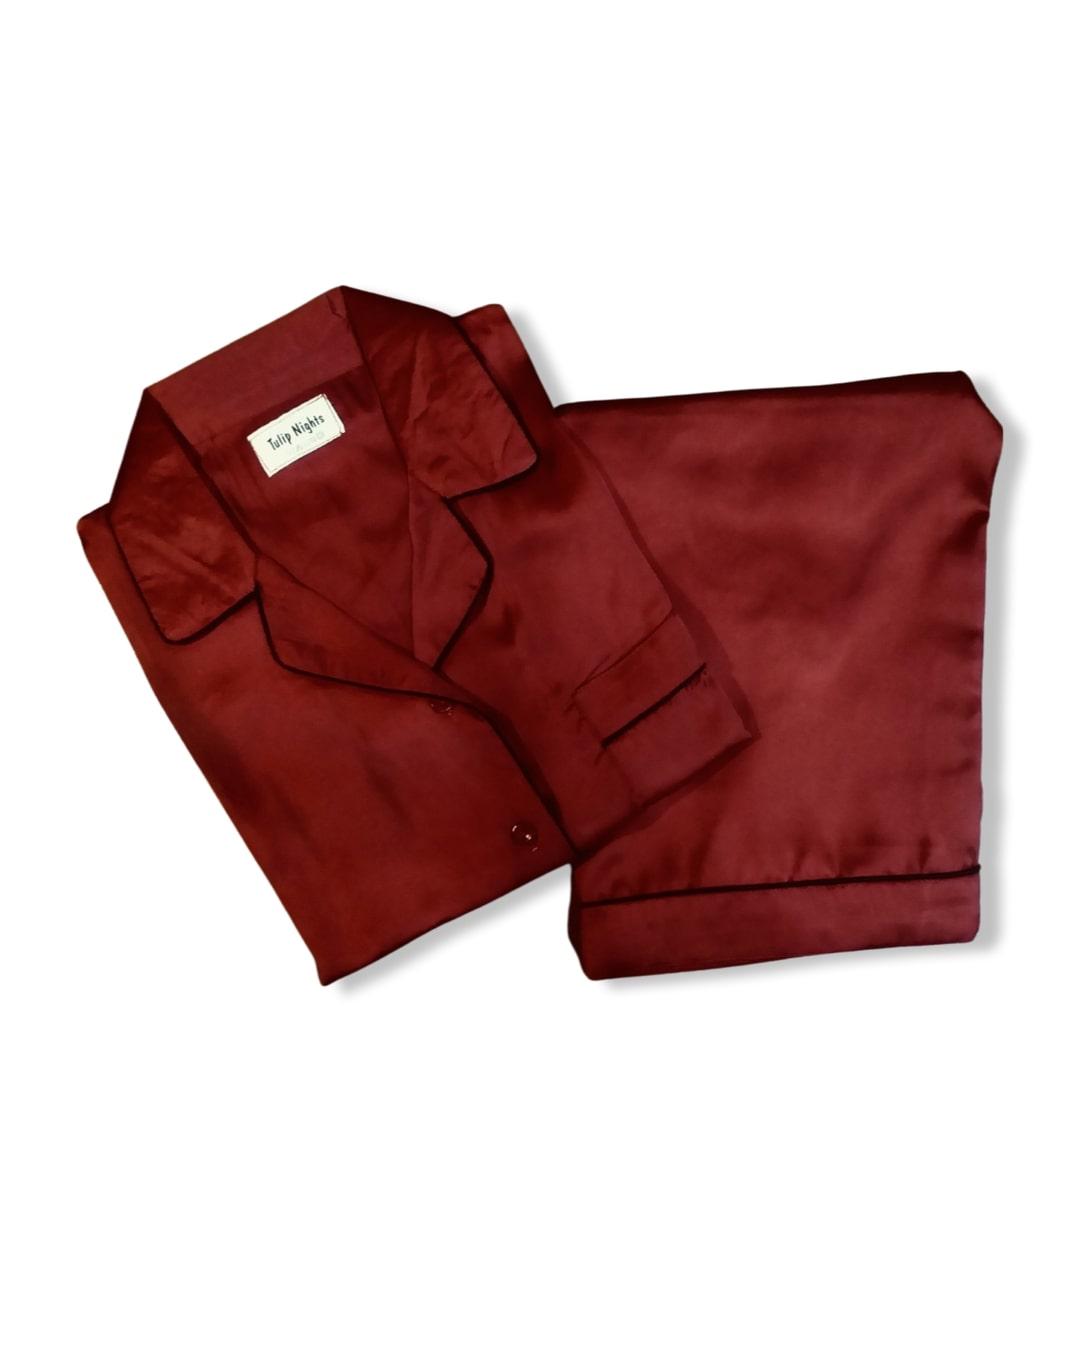 2PC Pyjamas Set MSLK-100089